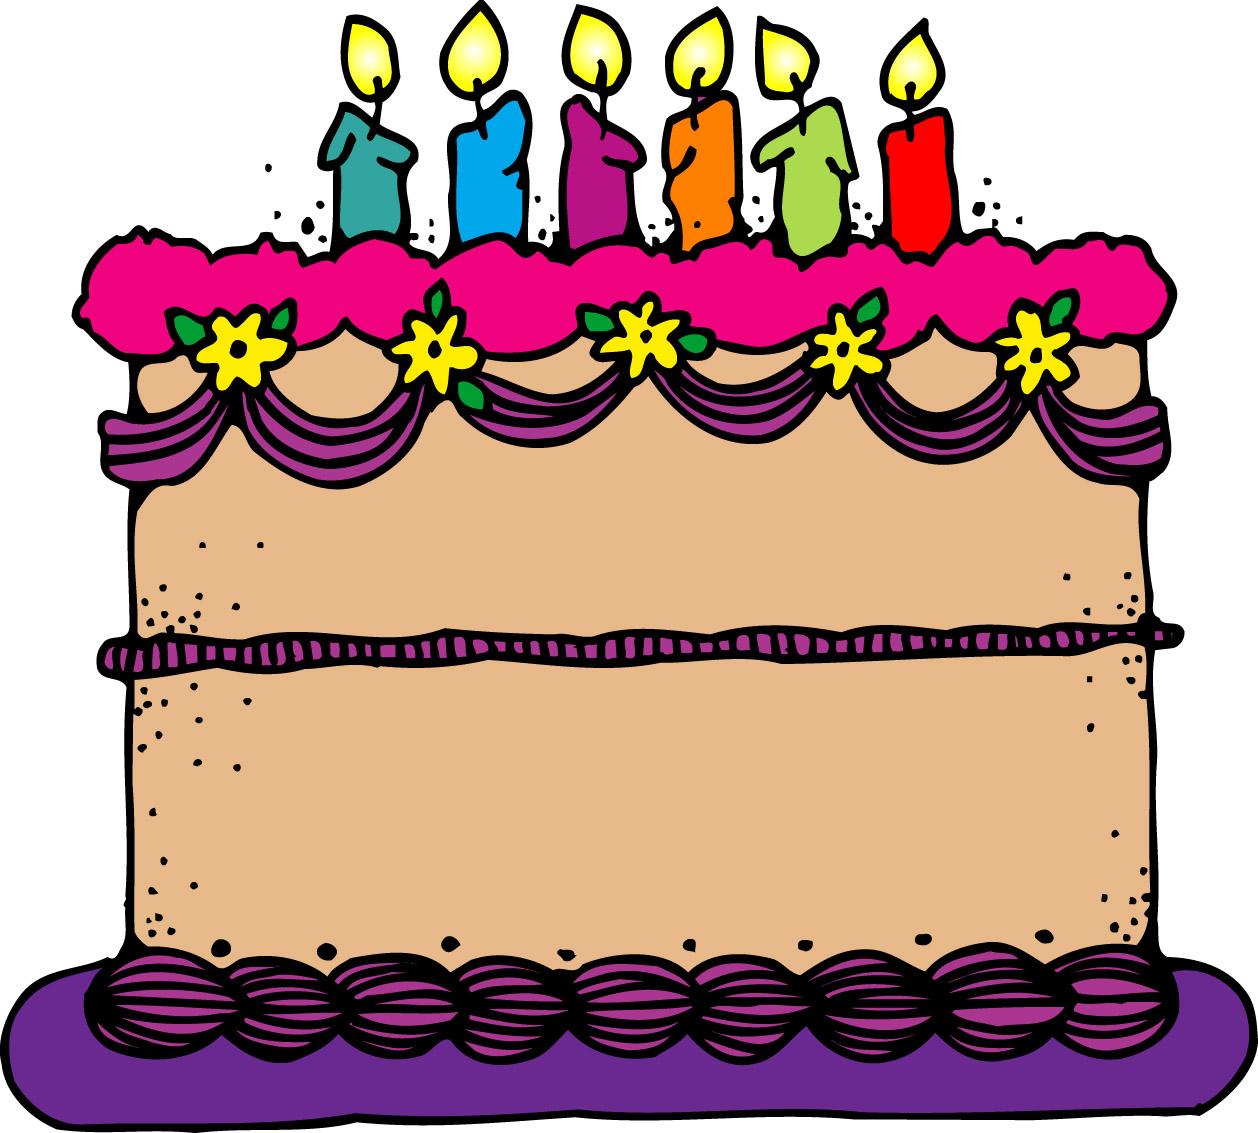 Birthday cake clip art free .-Birthday cake clip art free .-13